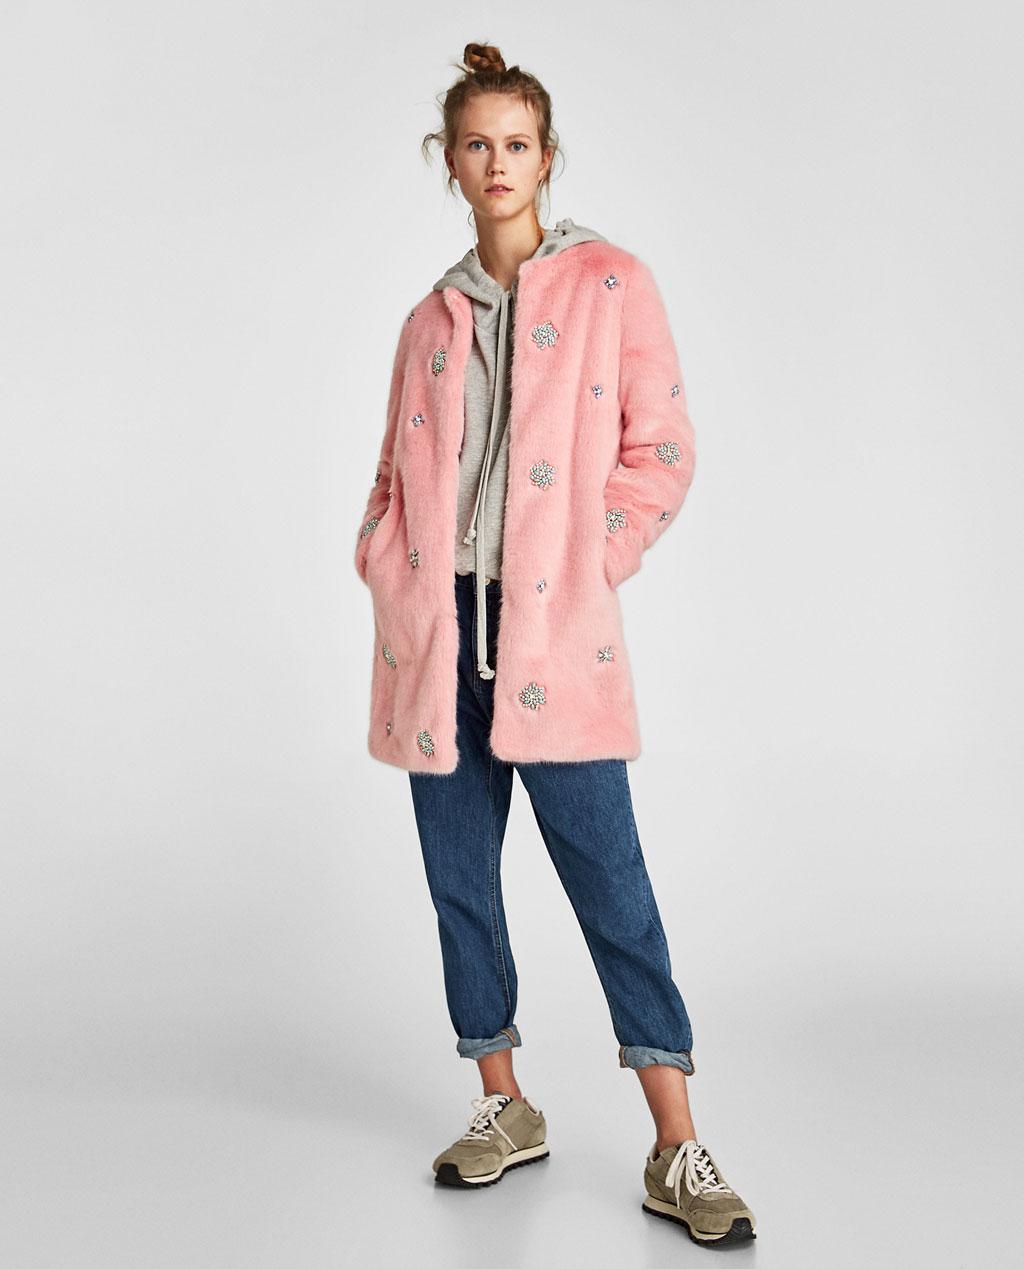 https://www.zara.com/us/en/bejewelled-faux-fur-coat-p04369254.html?v1=5290263&v2=499001